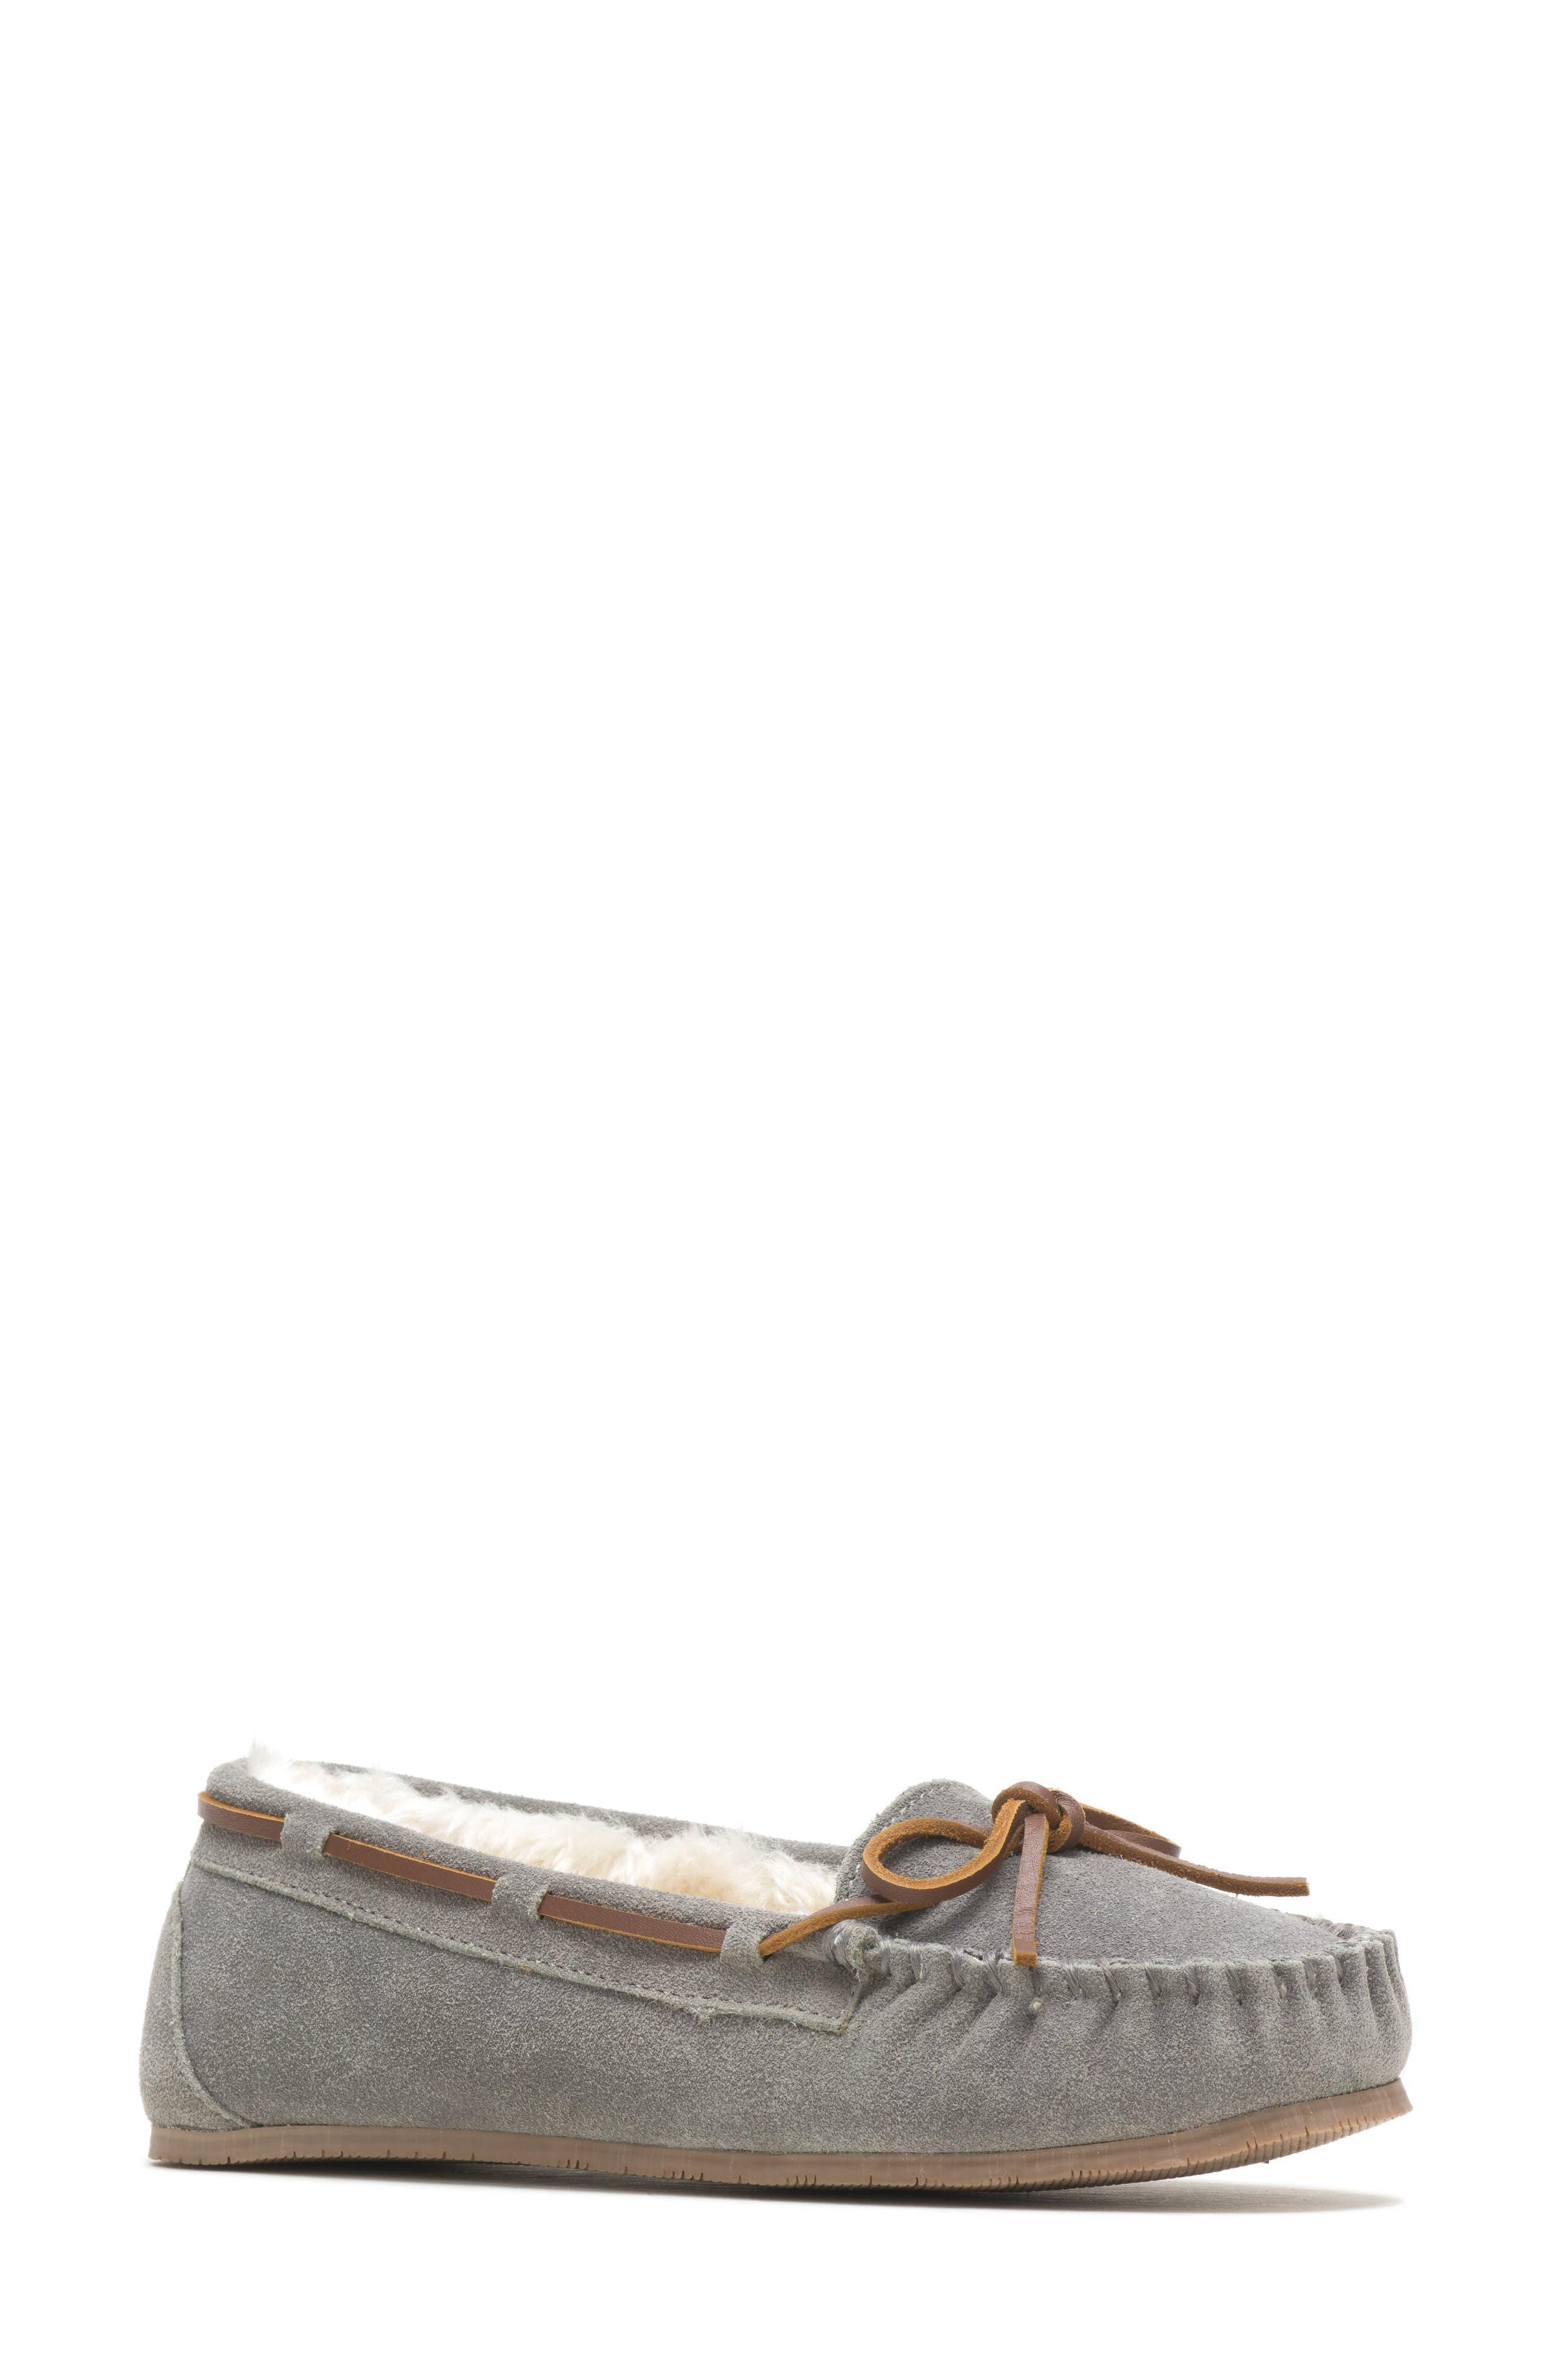 Zoe Water Resistant Moccasin Slipper